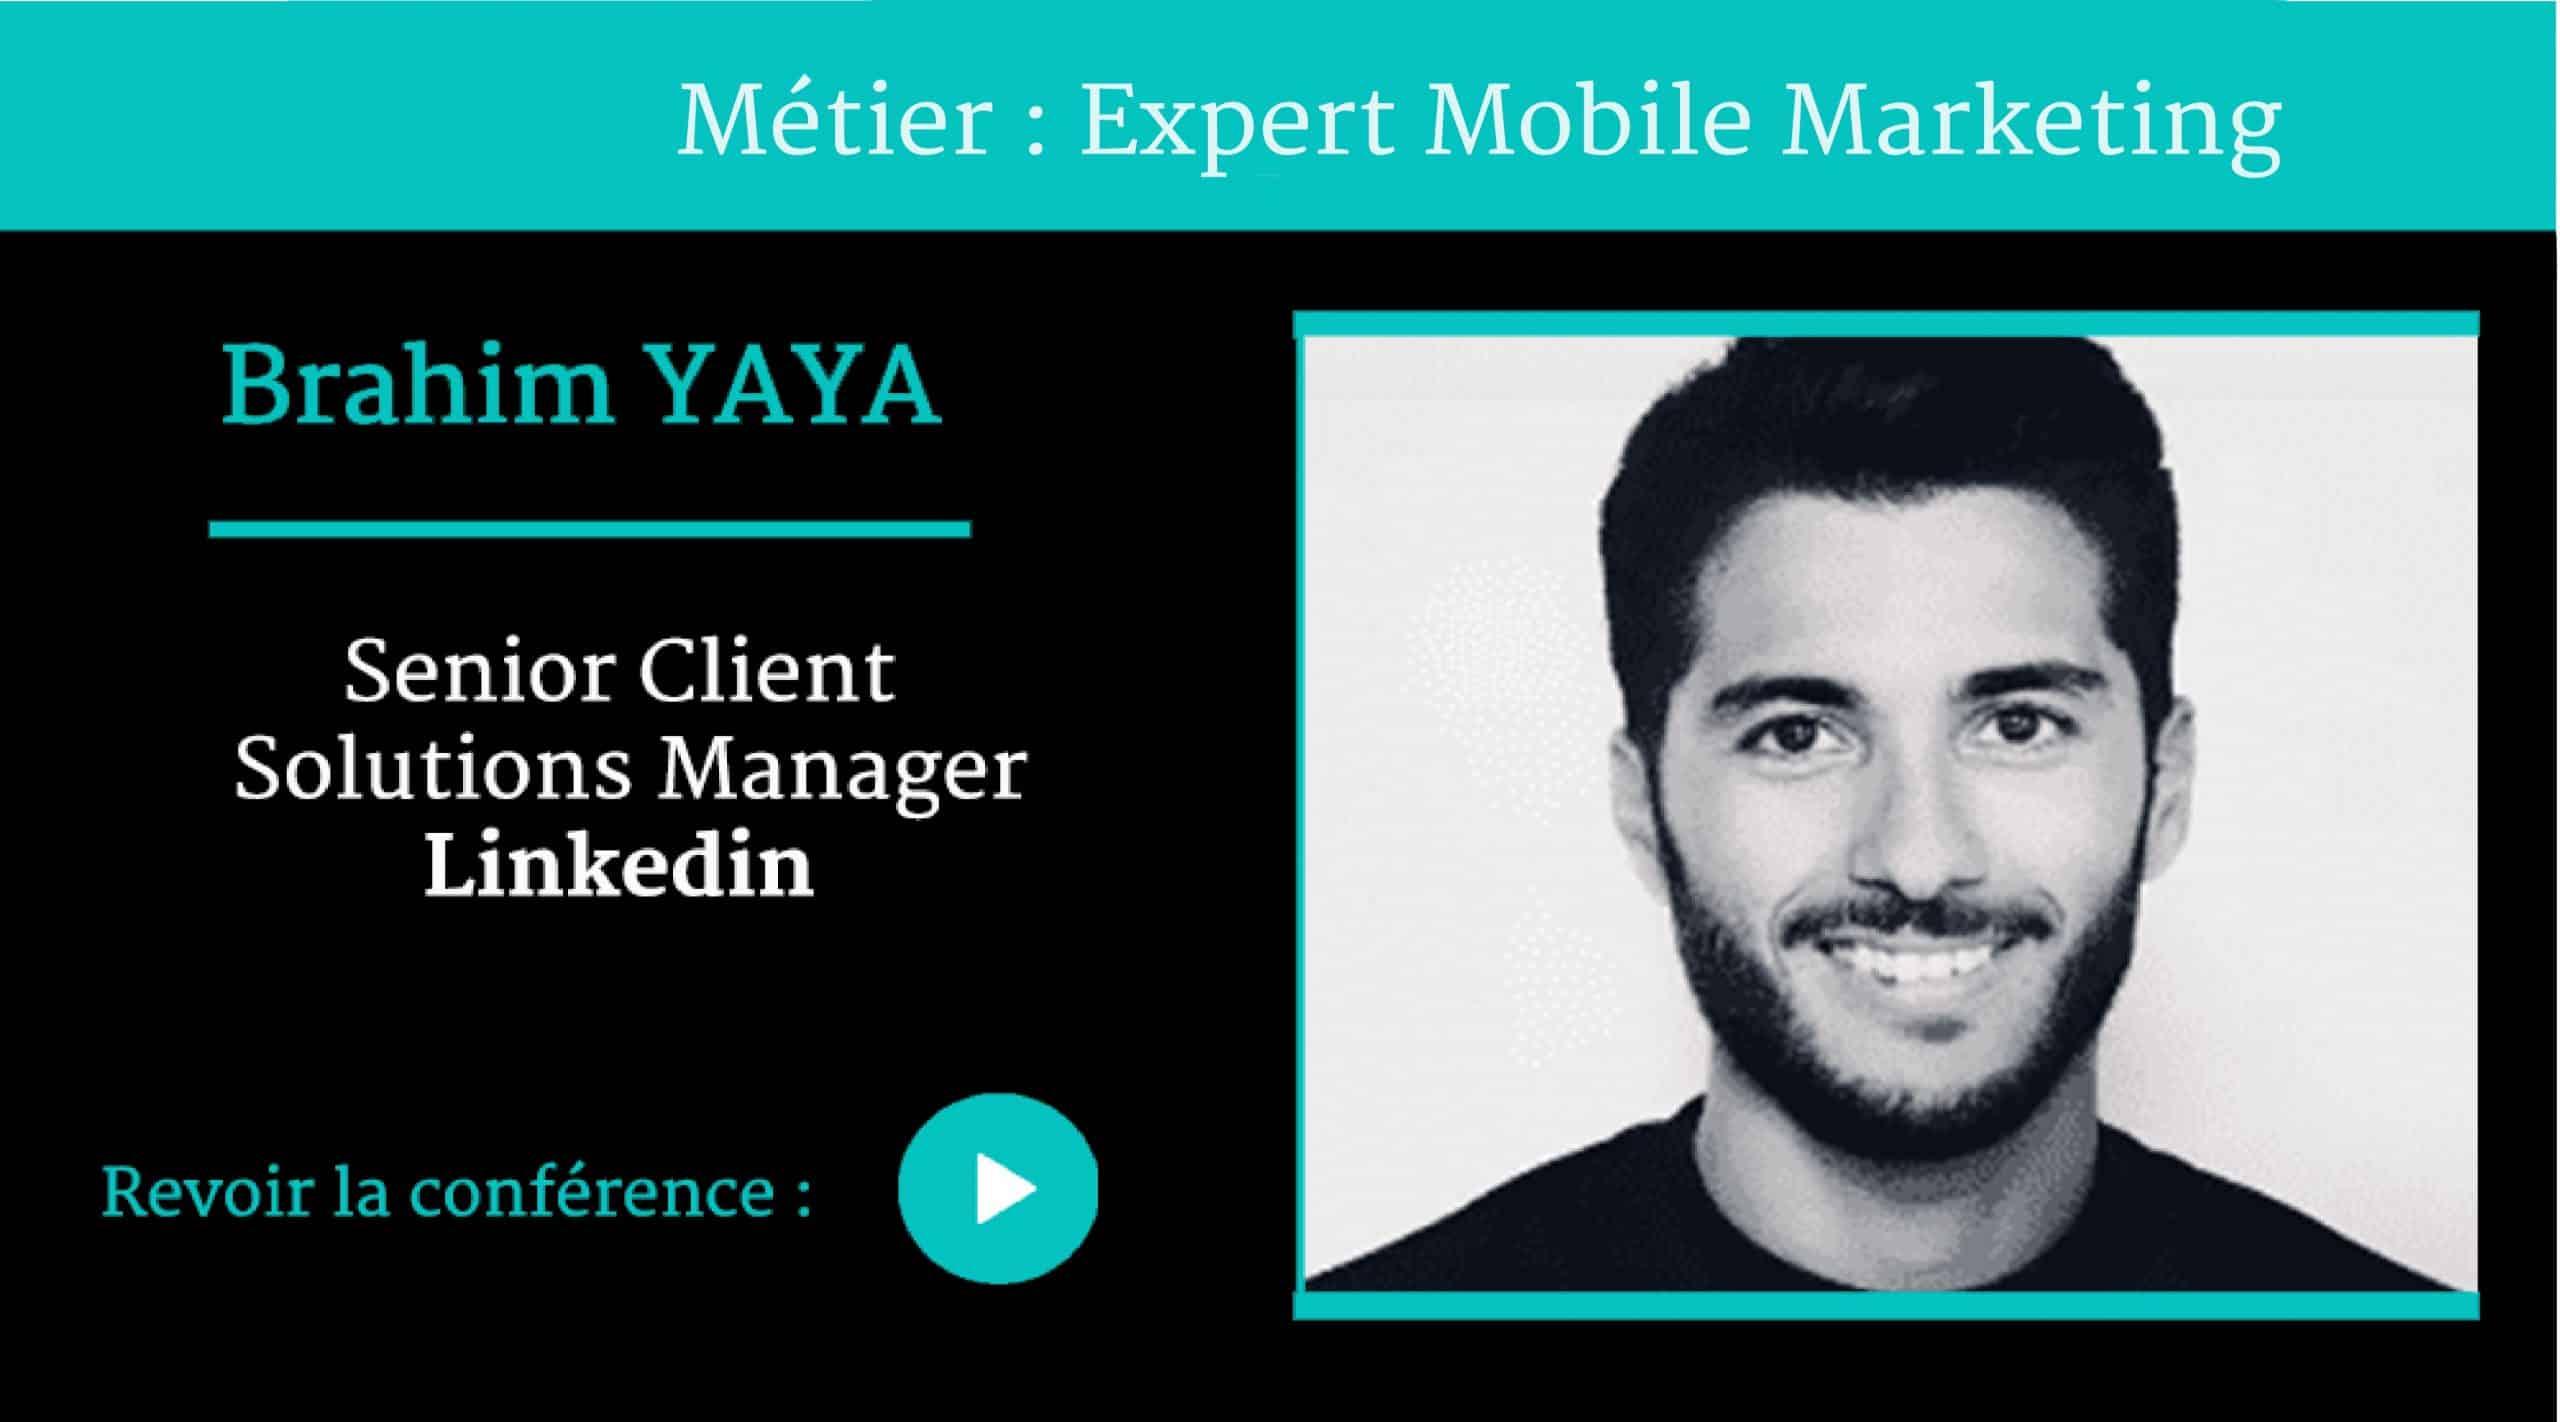 Métier Expert Mobile Marketing , conférence par Brahim YAYA ,pour Naïas – National Institute of Advertising Strategy